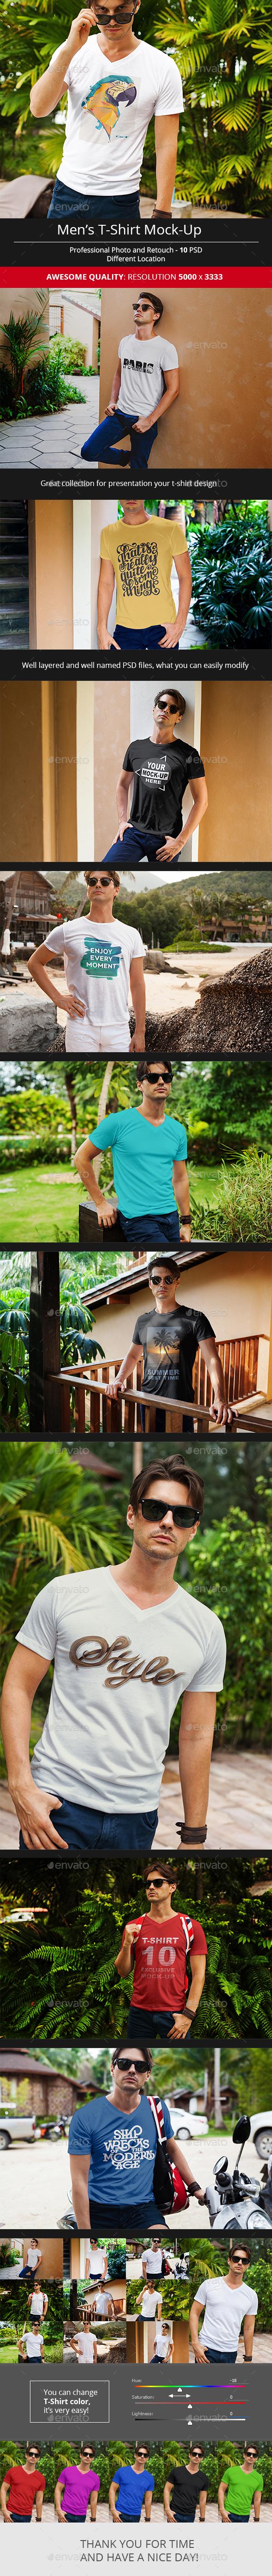 Men's T-Shirt Mock-Up